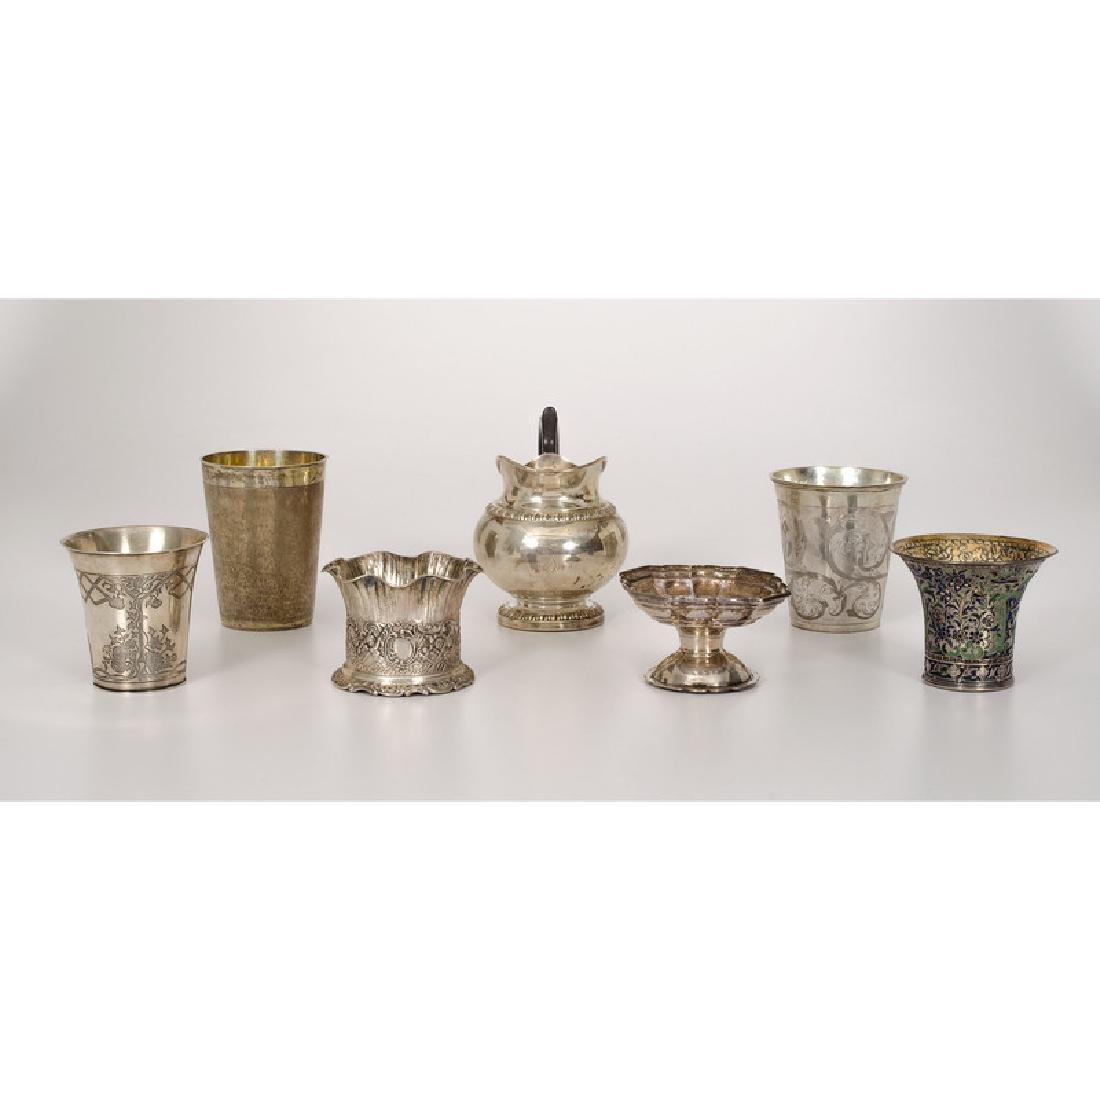 European Silver Beakers, Creamer and Open Salt